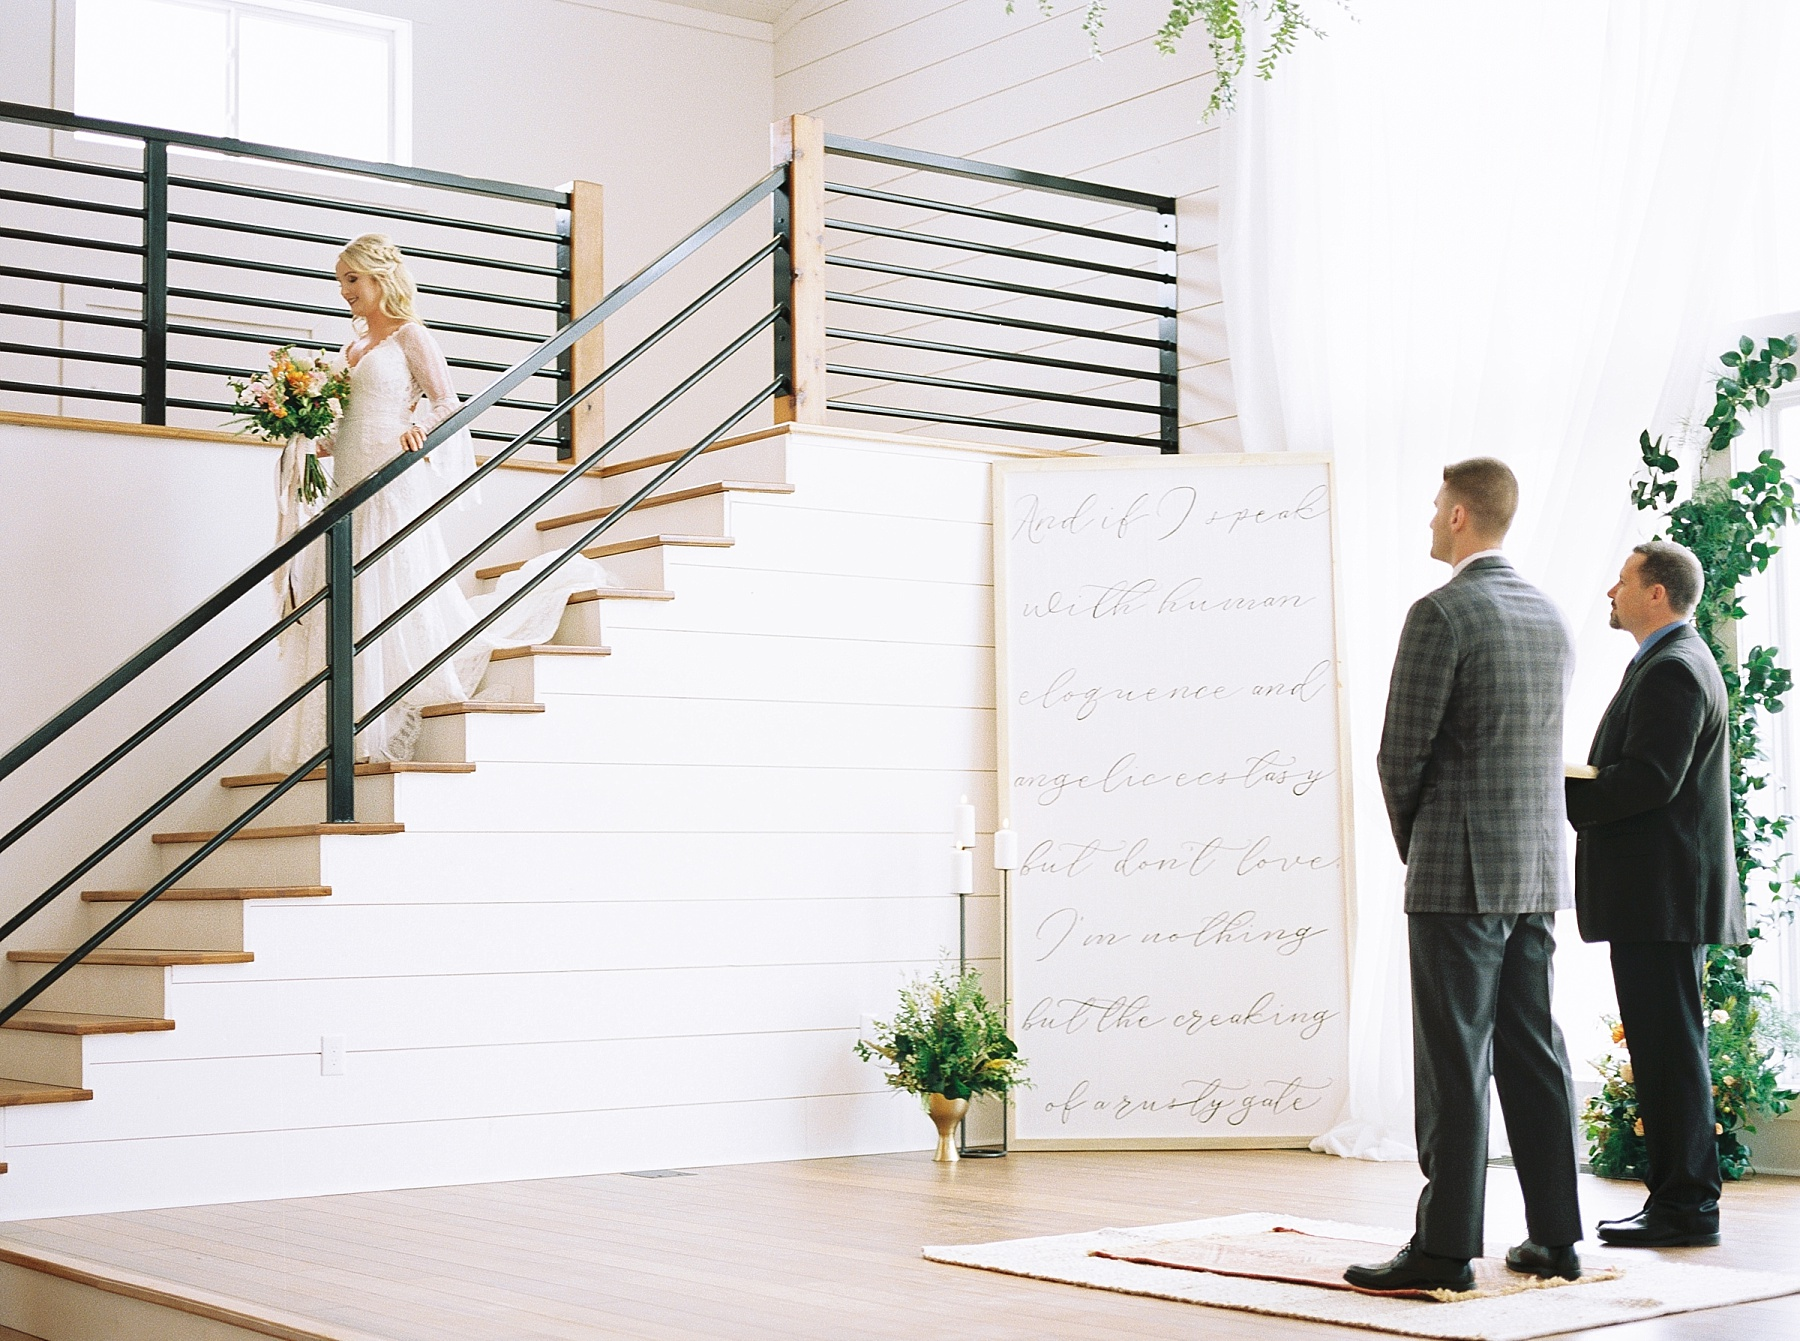 Eclectic Scandinavian Winter Wedding in All White Venue Emerson Fields by Kelsi Kliethermes Photography Best Missouri and Maui Wedding Photographer_0005.jpg